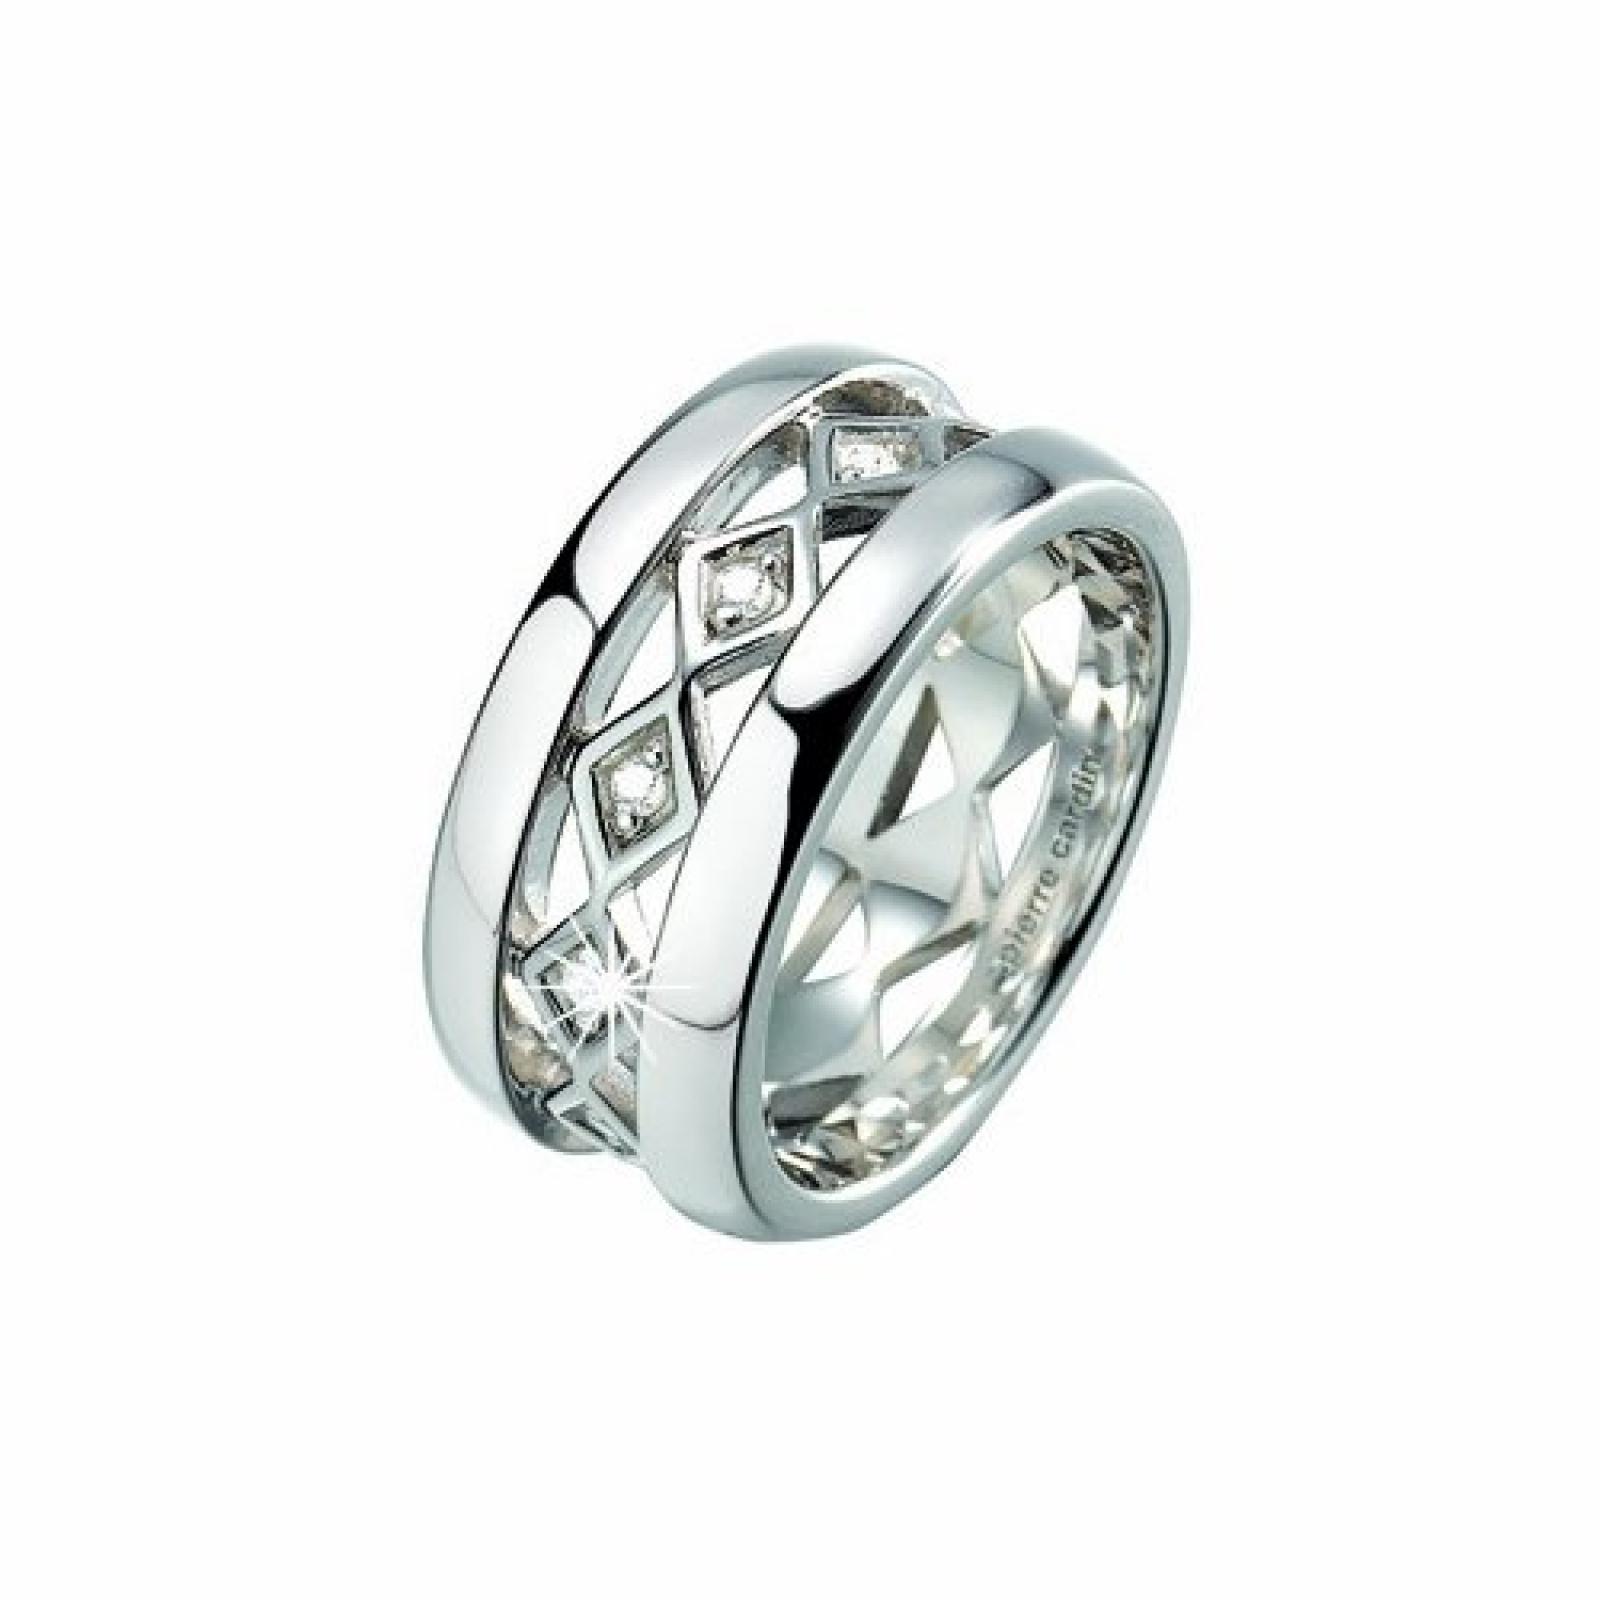 Pierre Cardin Damen-Ring Douceur Sterling-Silber 925 PCRG90286A